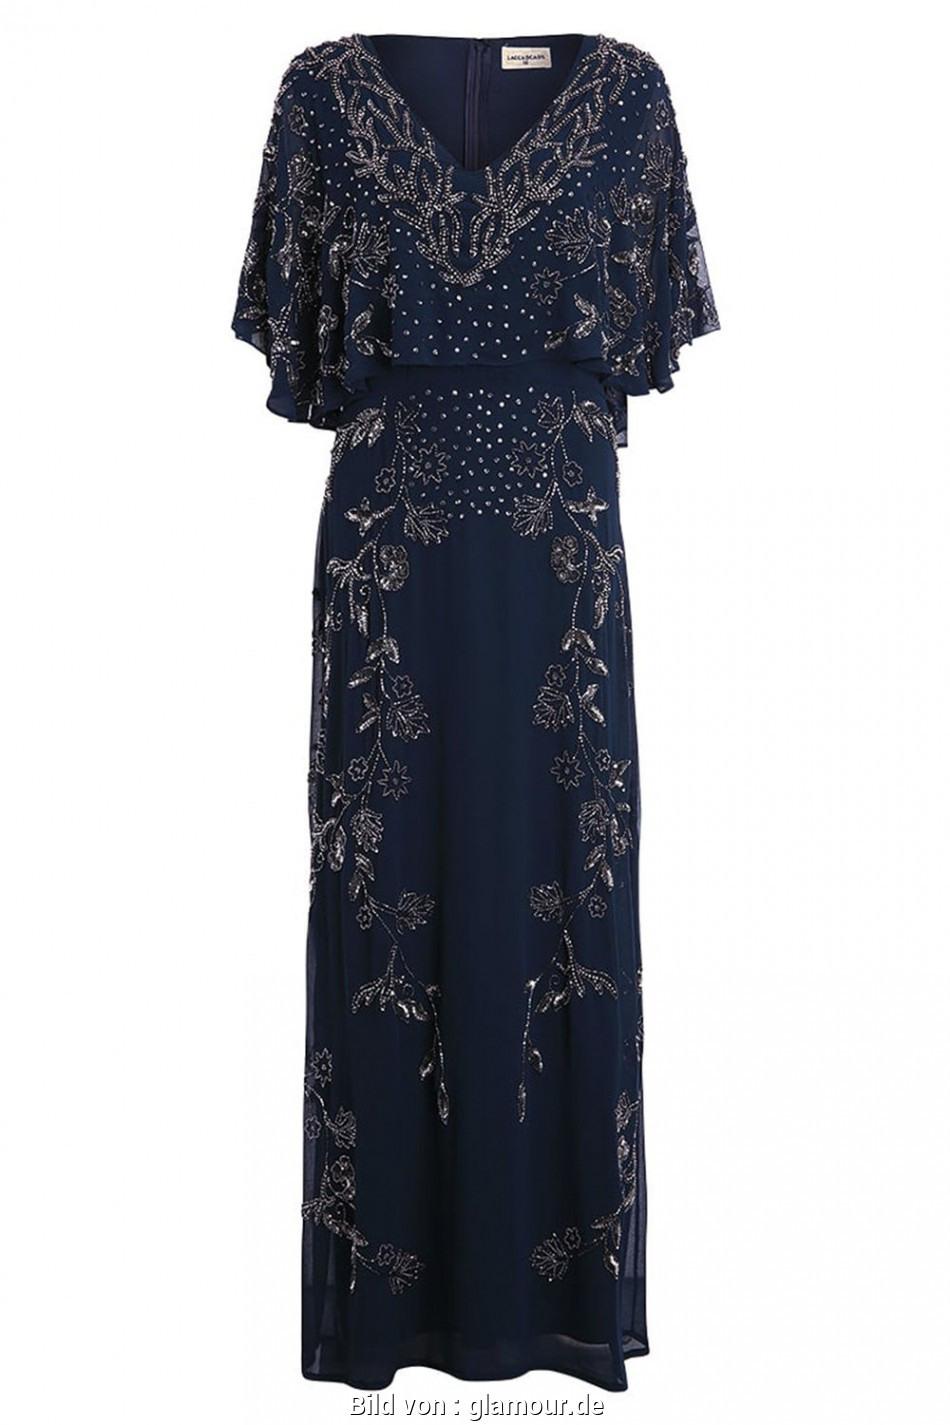 Designer Perfekt Zalando Damen Abendkleid Spezialgebiet13 Genial Zalando Damen Abendkleid Spezialgebiet